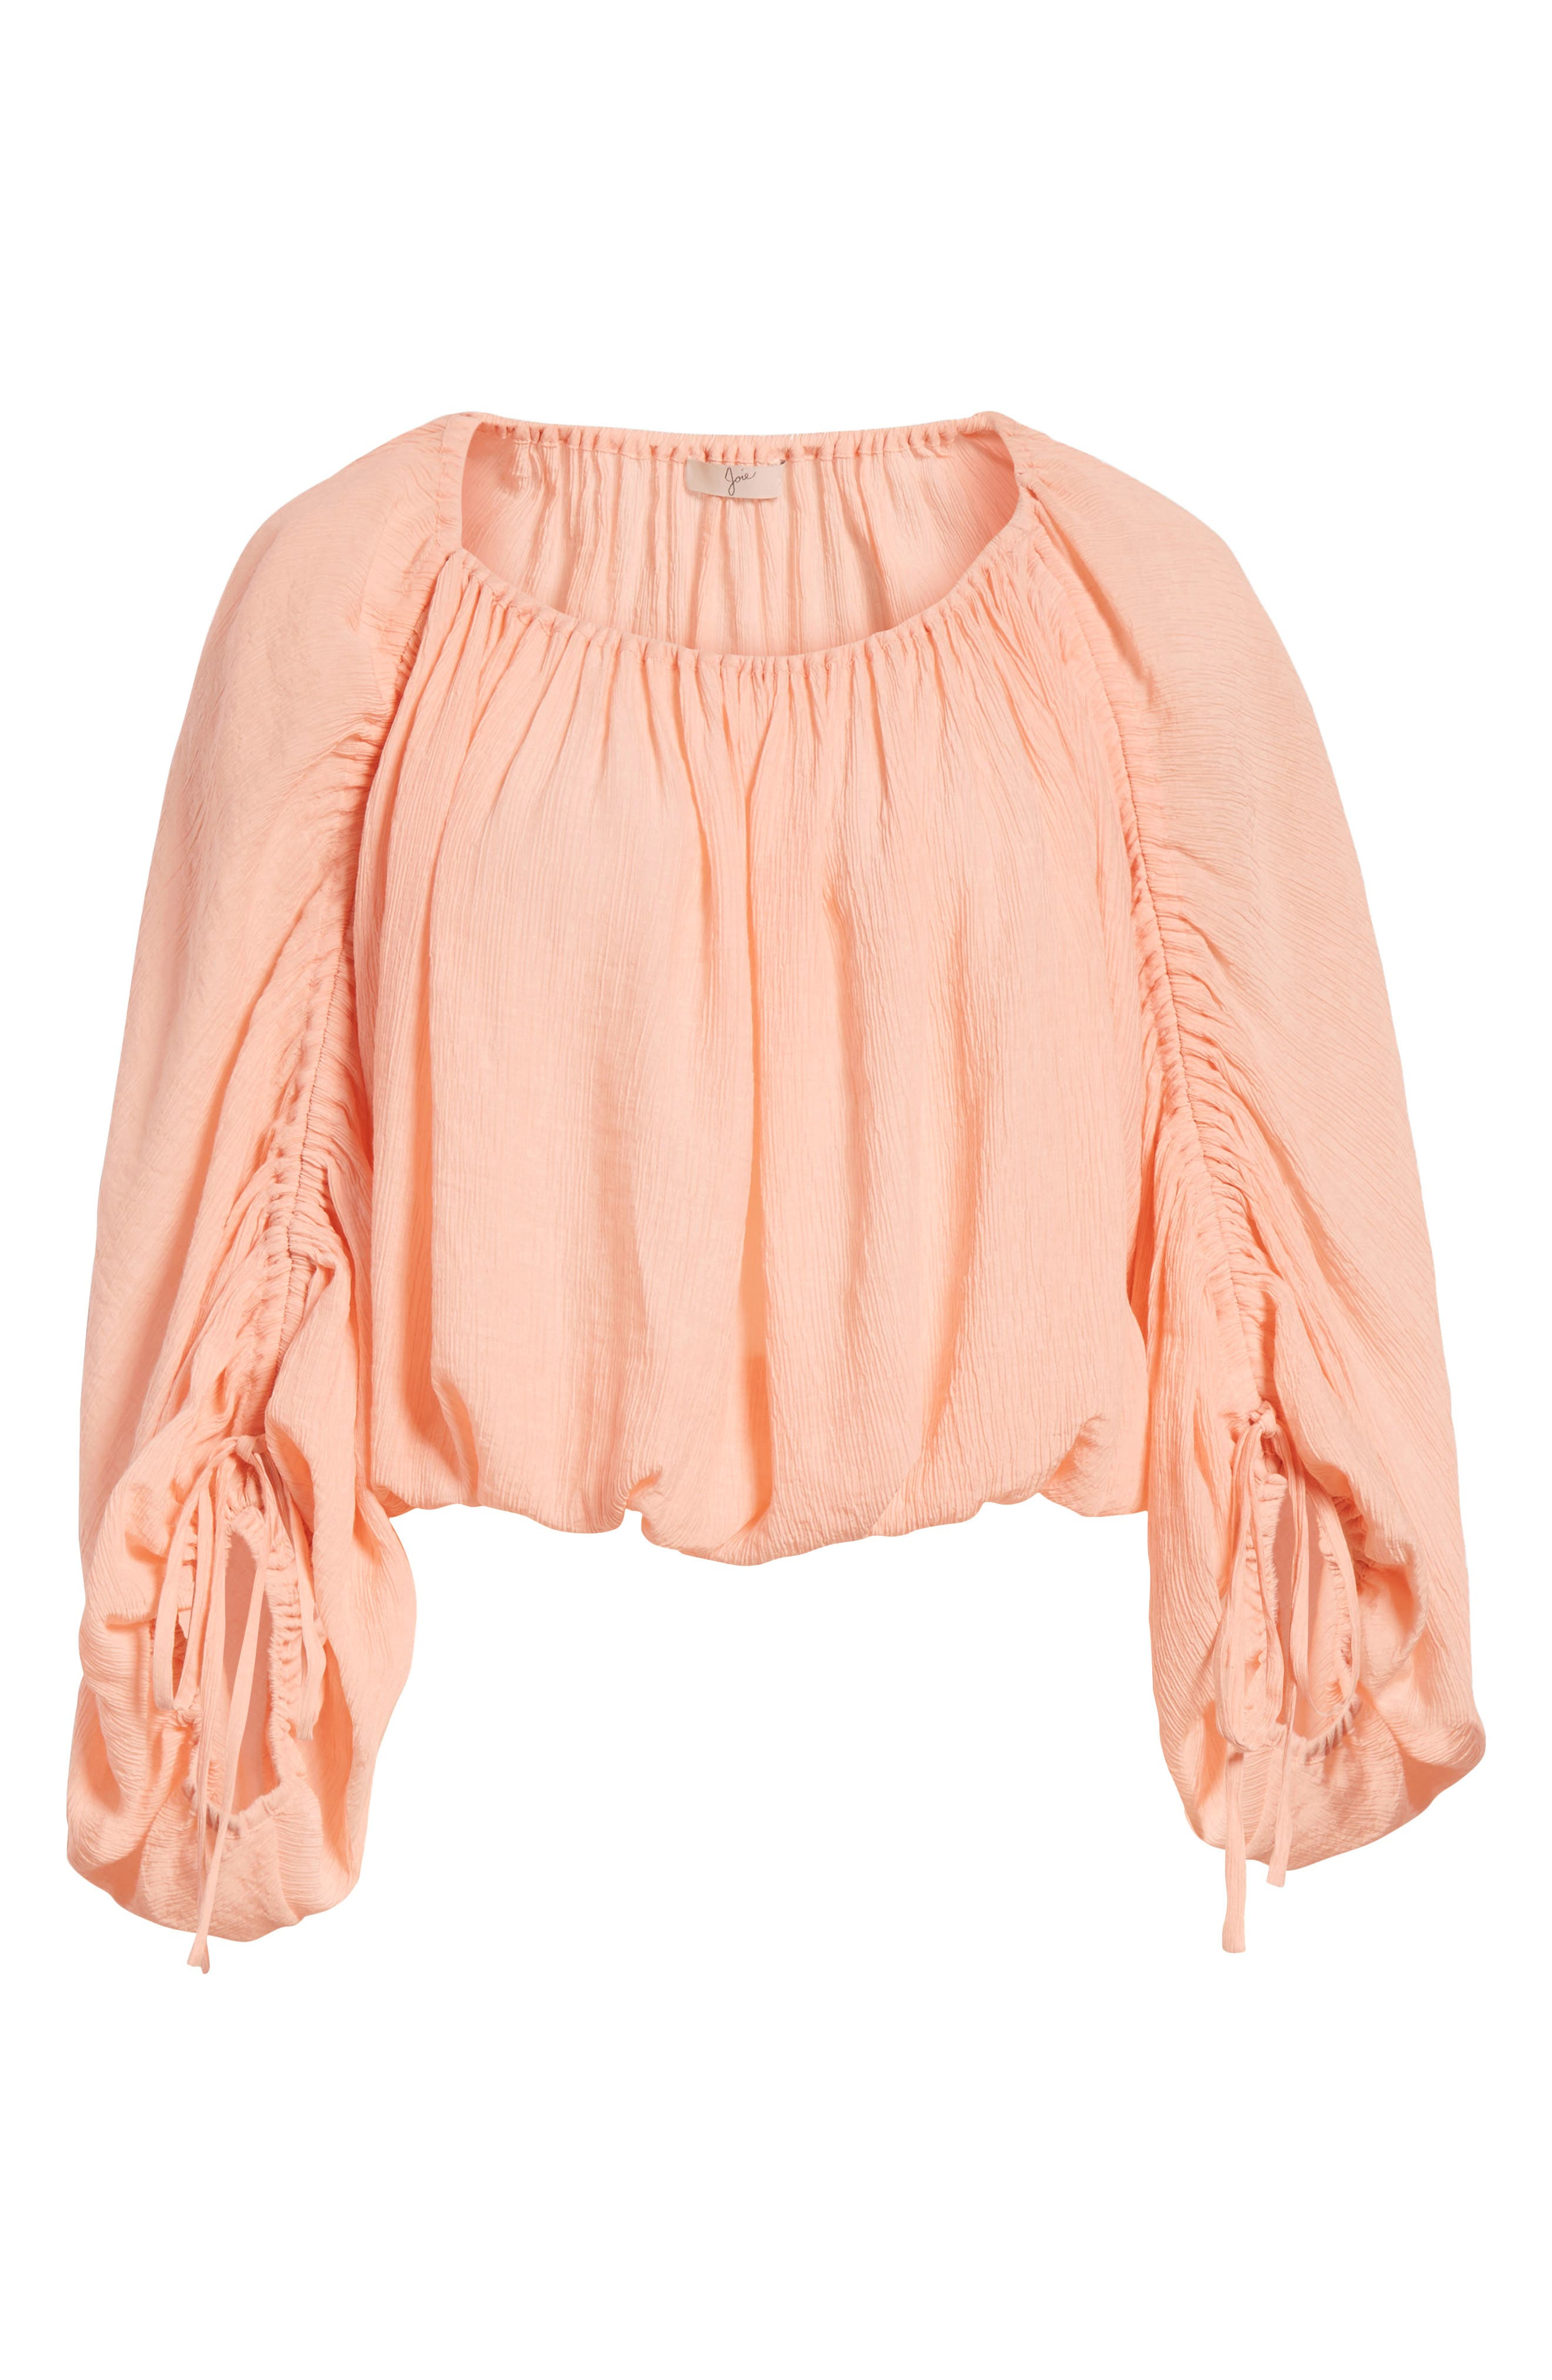 Elazara Ruched Sleeve Peasant Top,                             Alternate thumbnail 6, color,                             Summer Pink